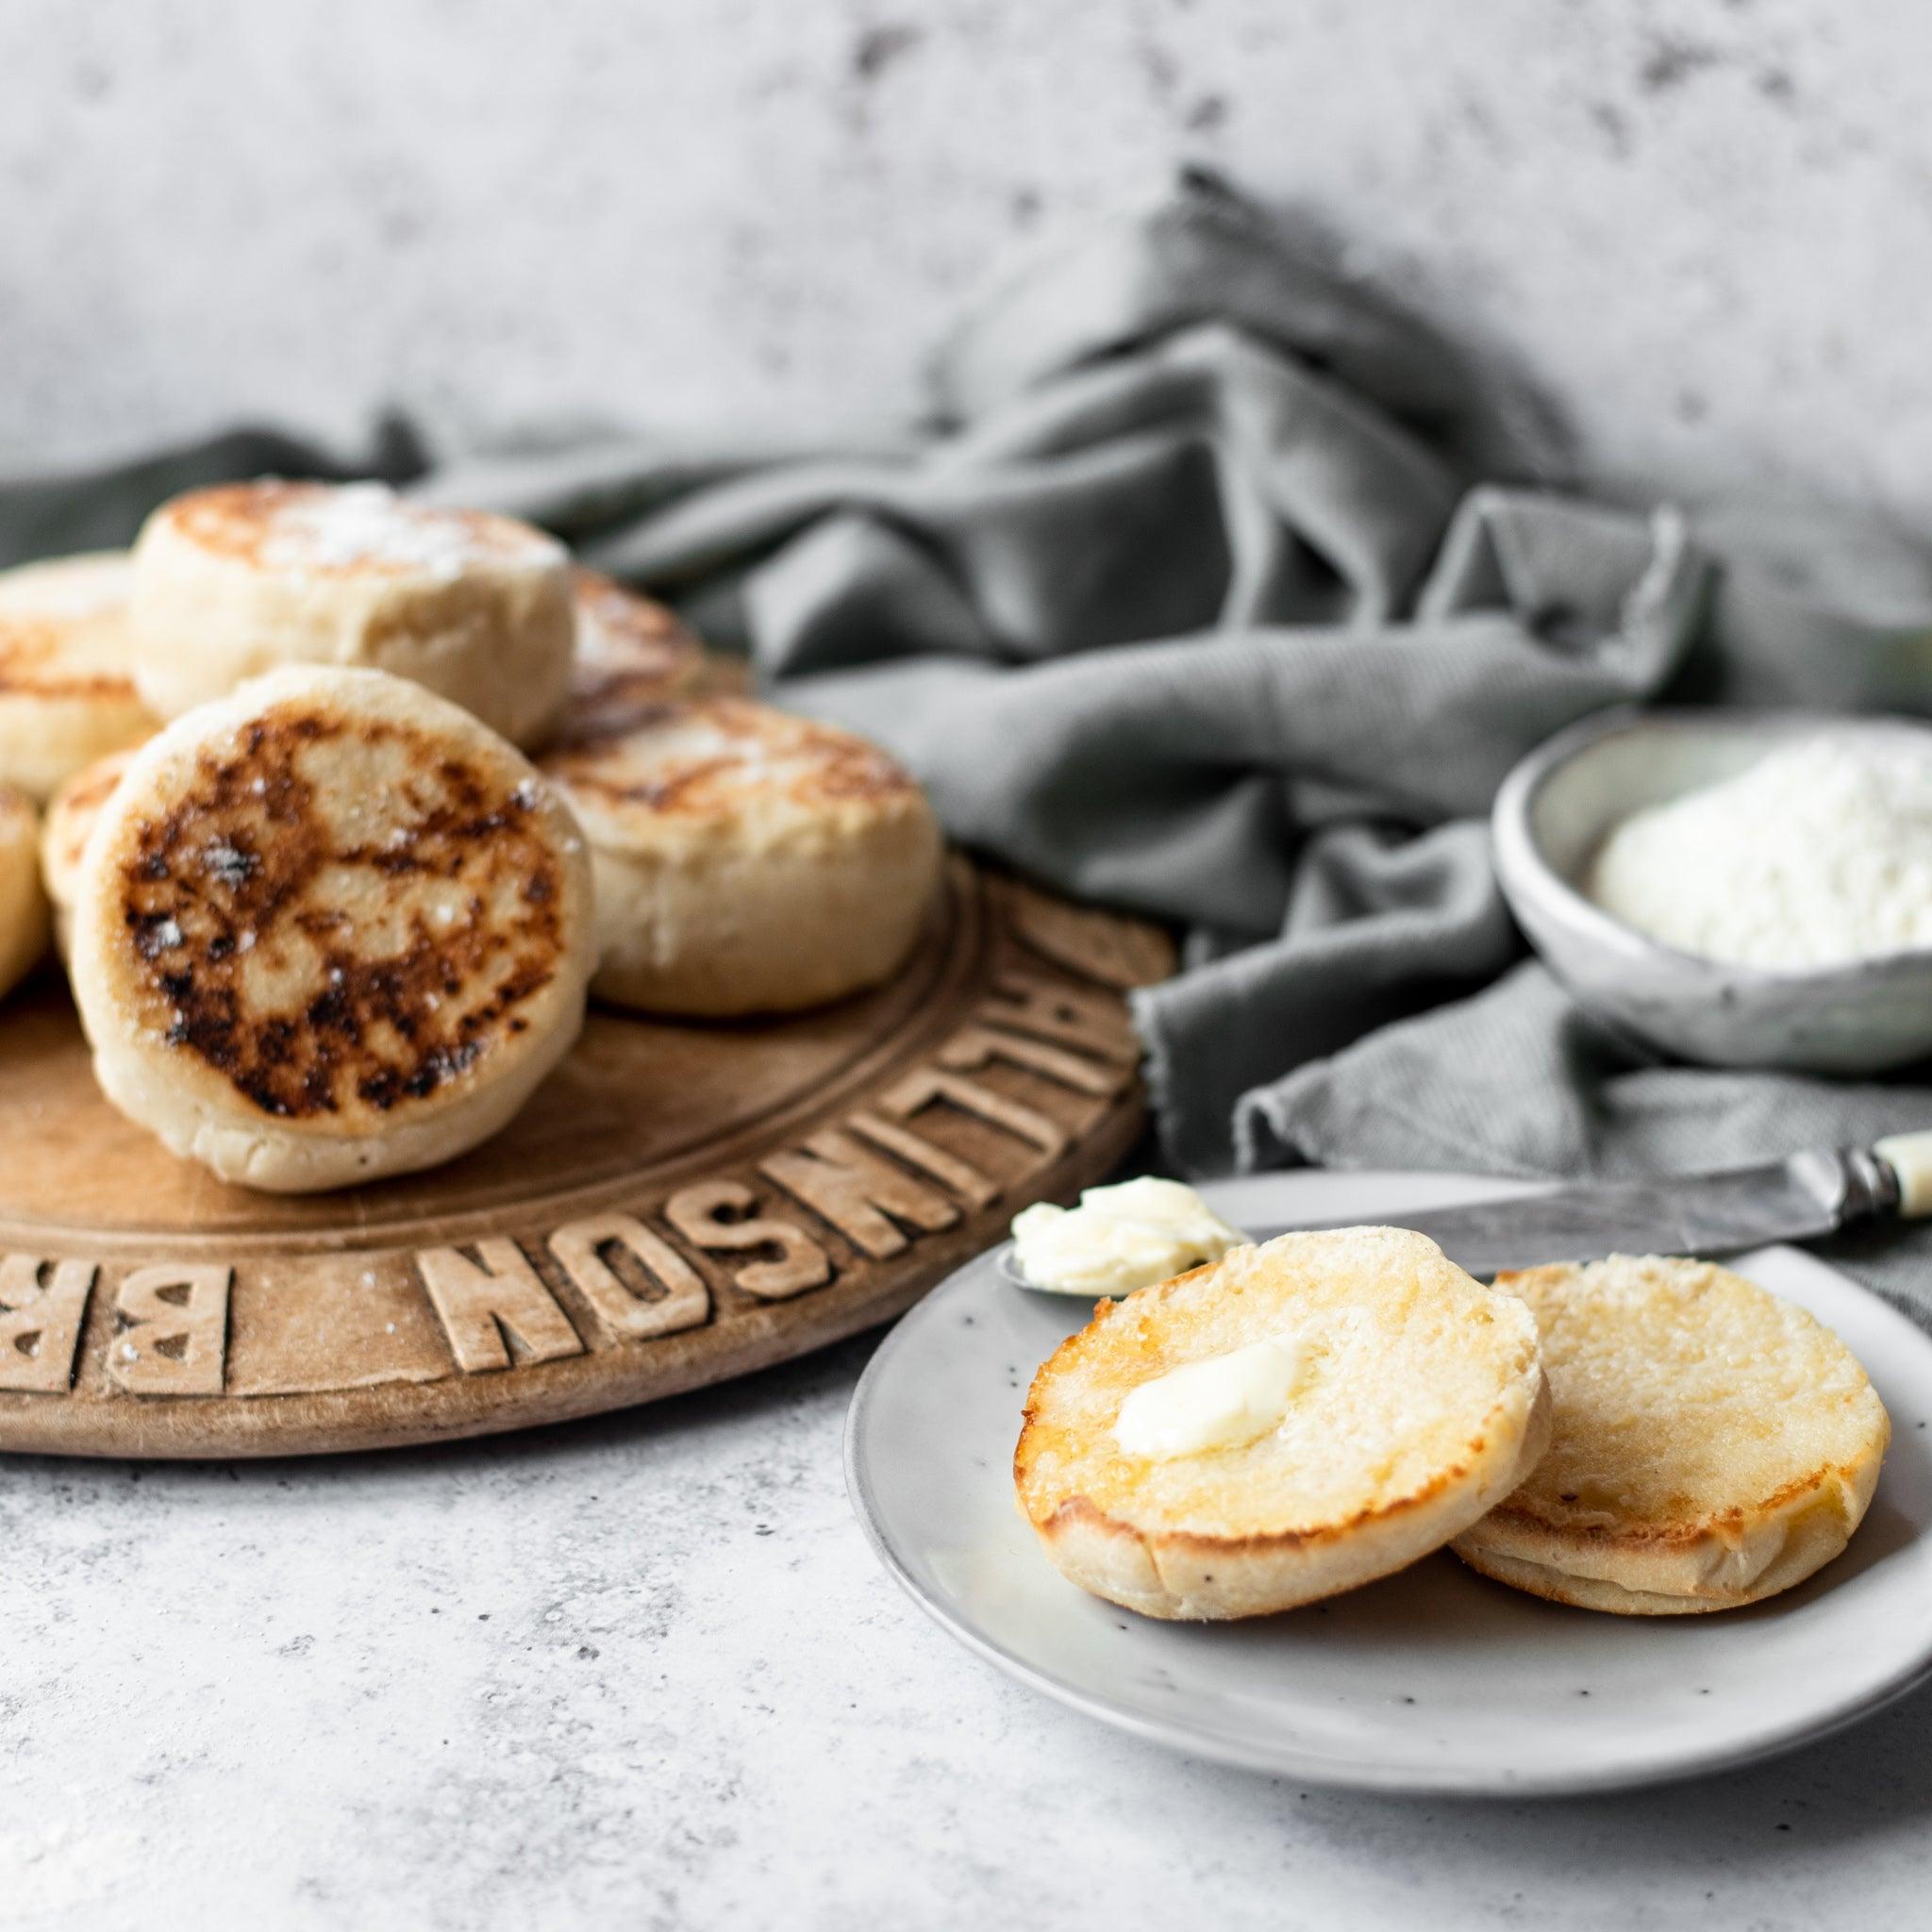 Allinsons-English-Muffins-1-1-Baking-Mad-7.jpg